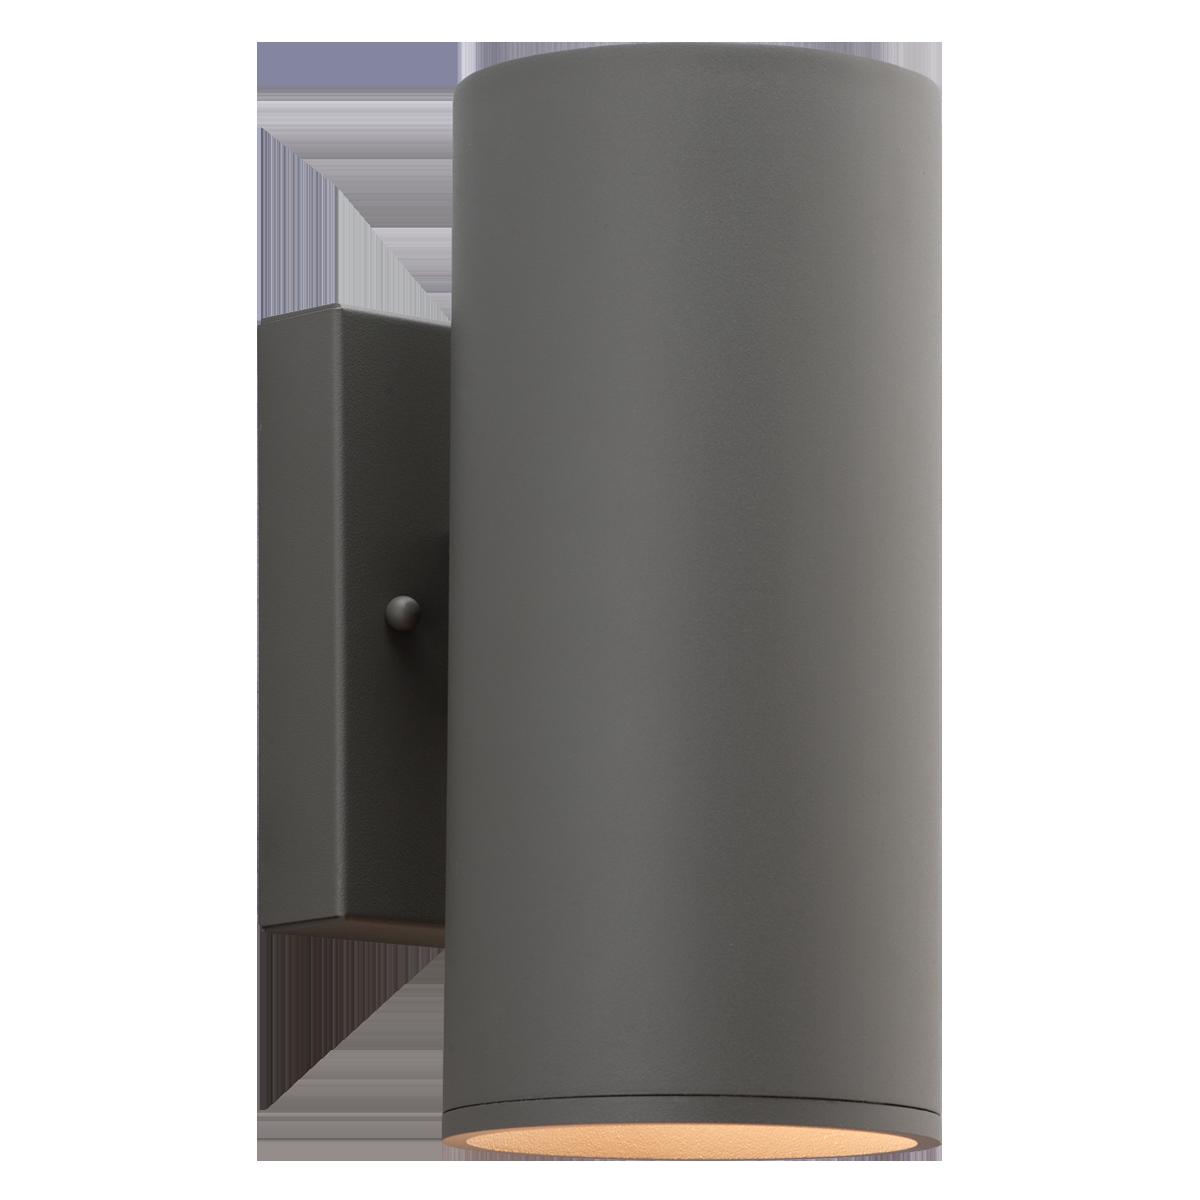 "5"" Round LED Wall Mount Downlight Cylinder, 2700K  -  90 CRI"